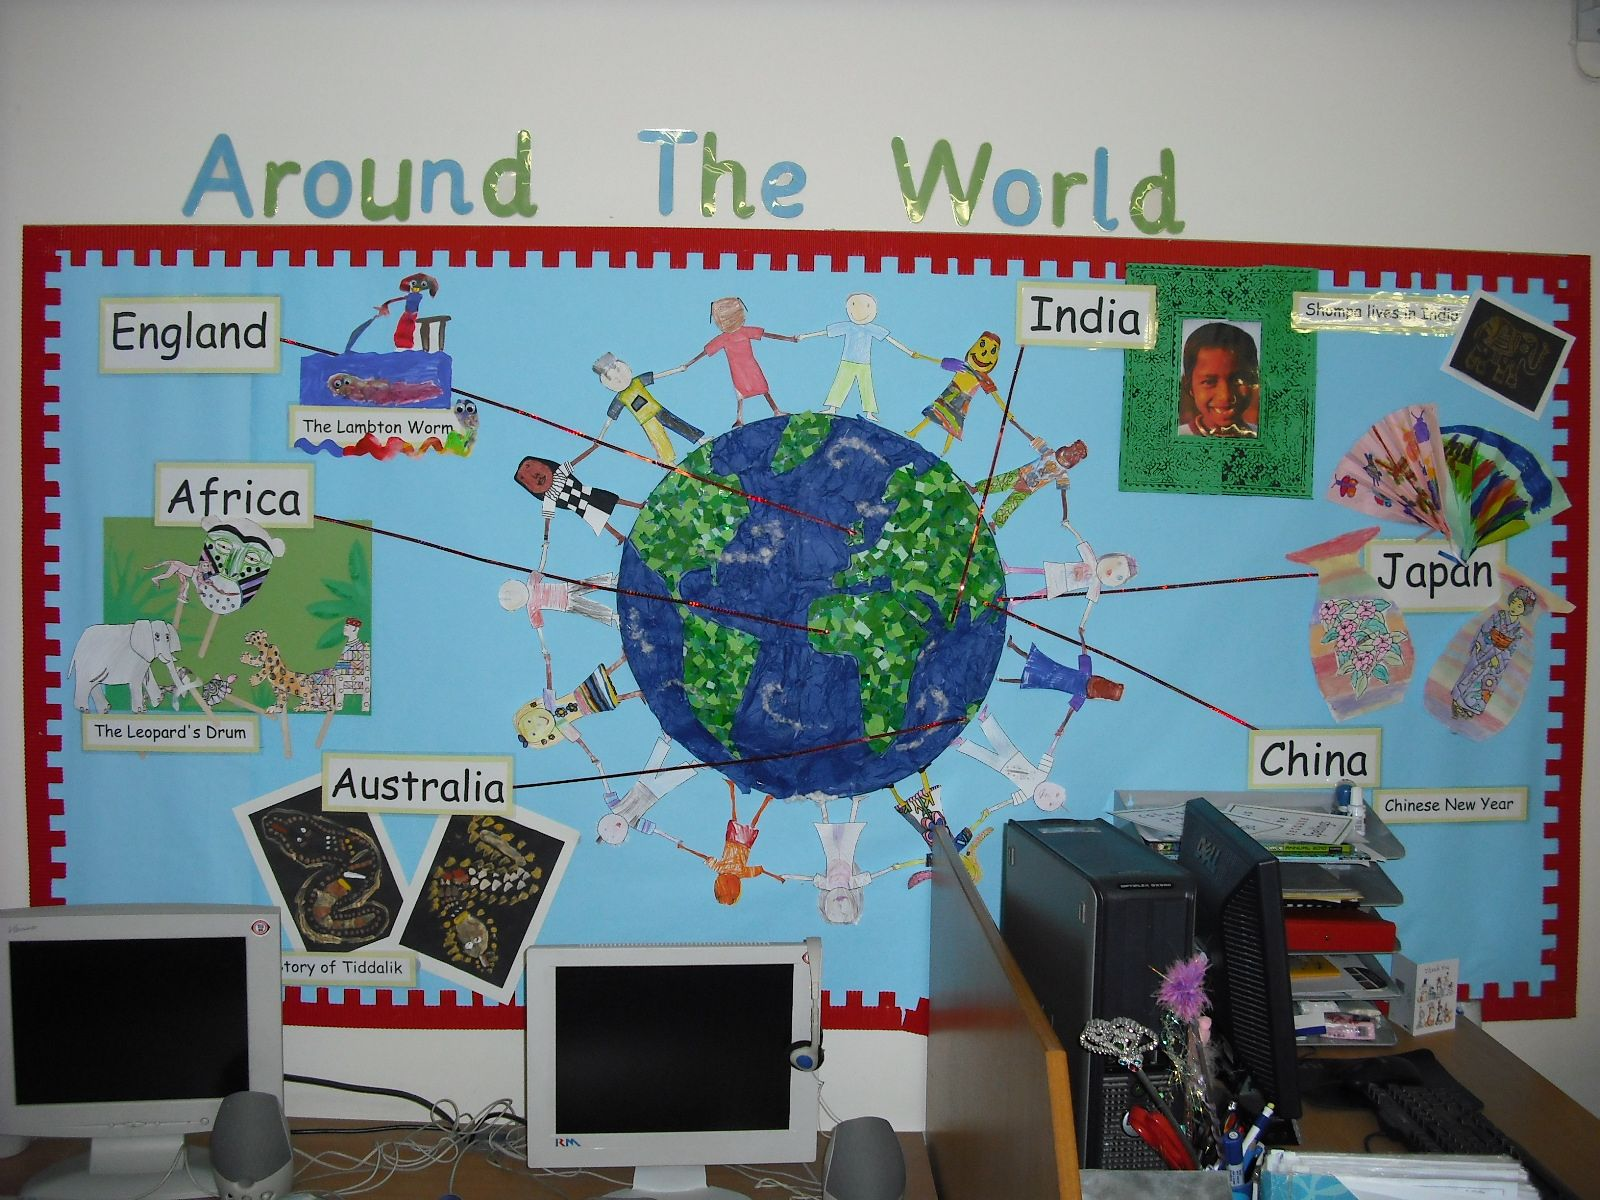 Round the world topic ks1 contemporary world issuesspecial round the world topic ks1 gumiabroncs Images